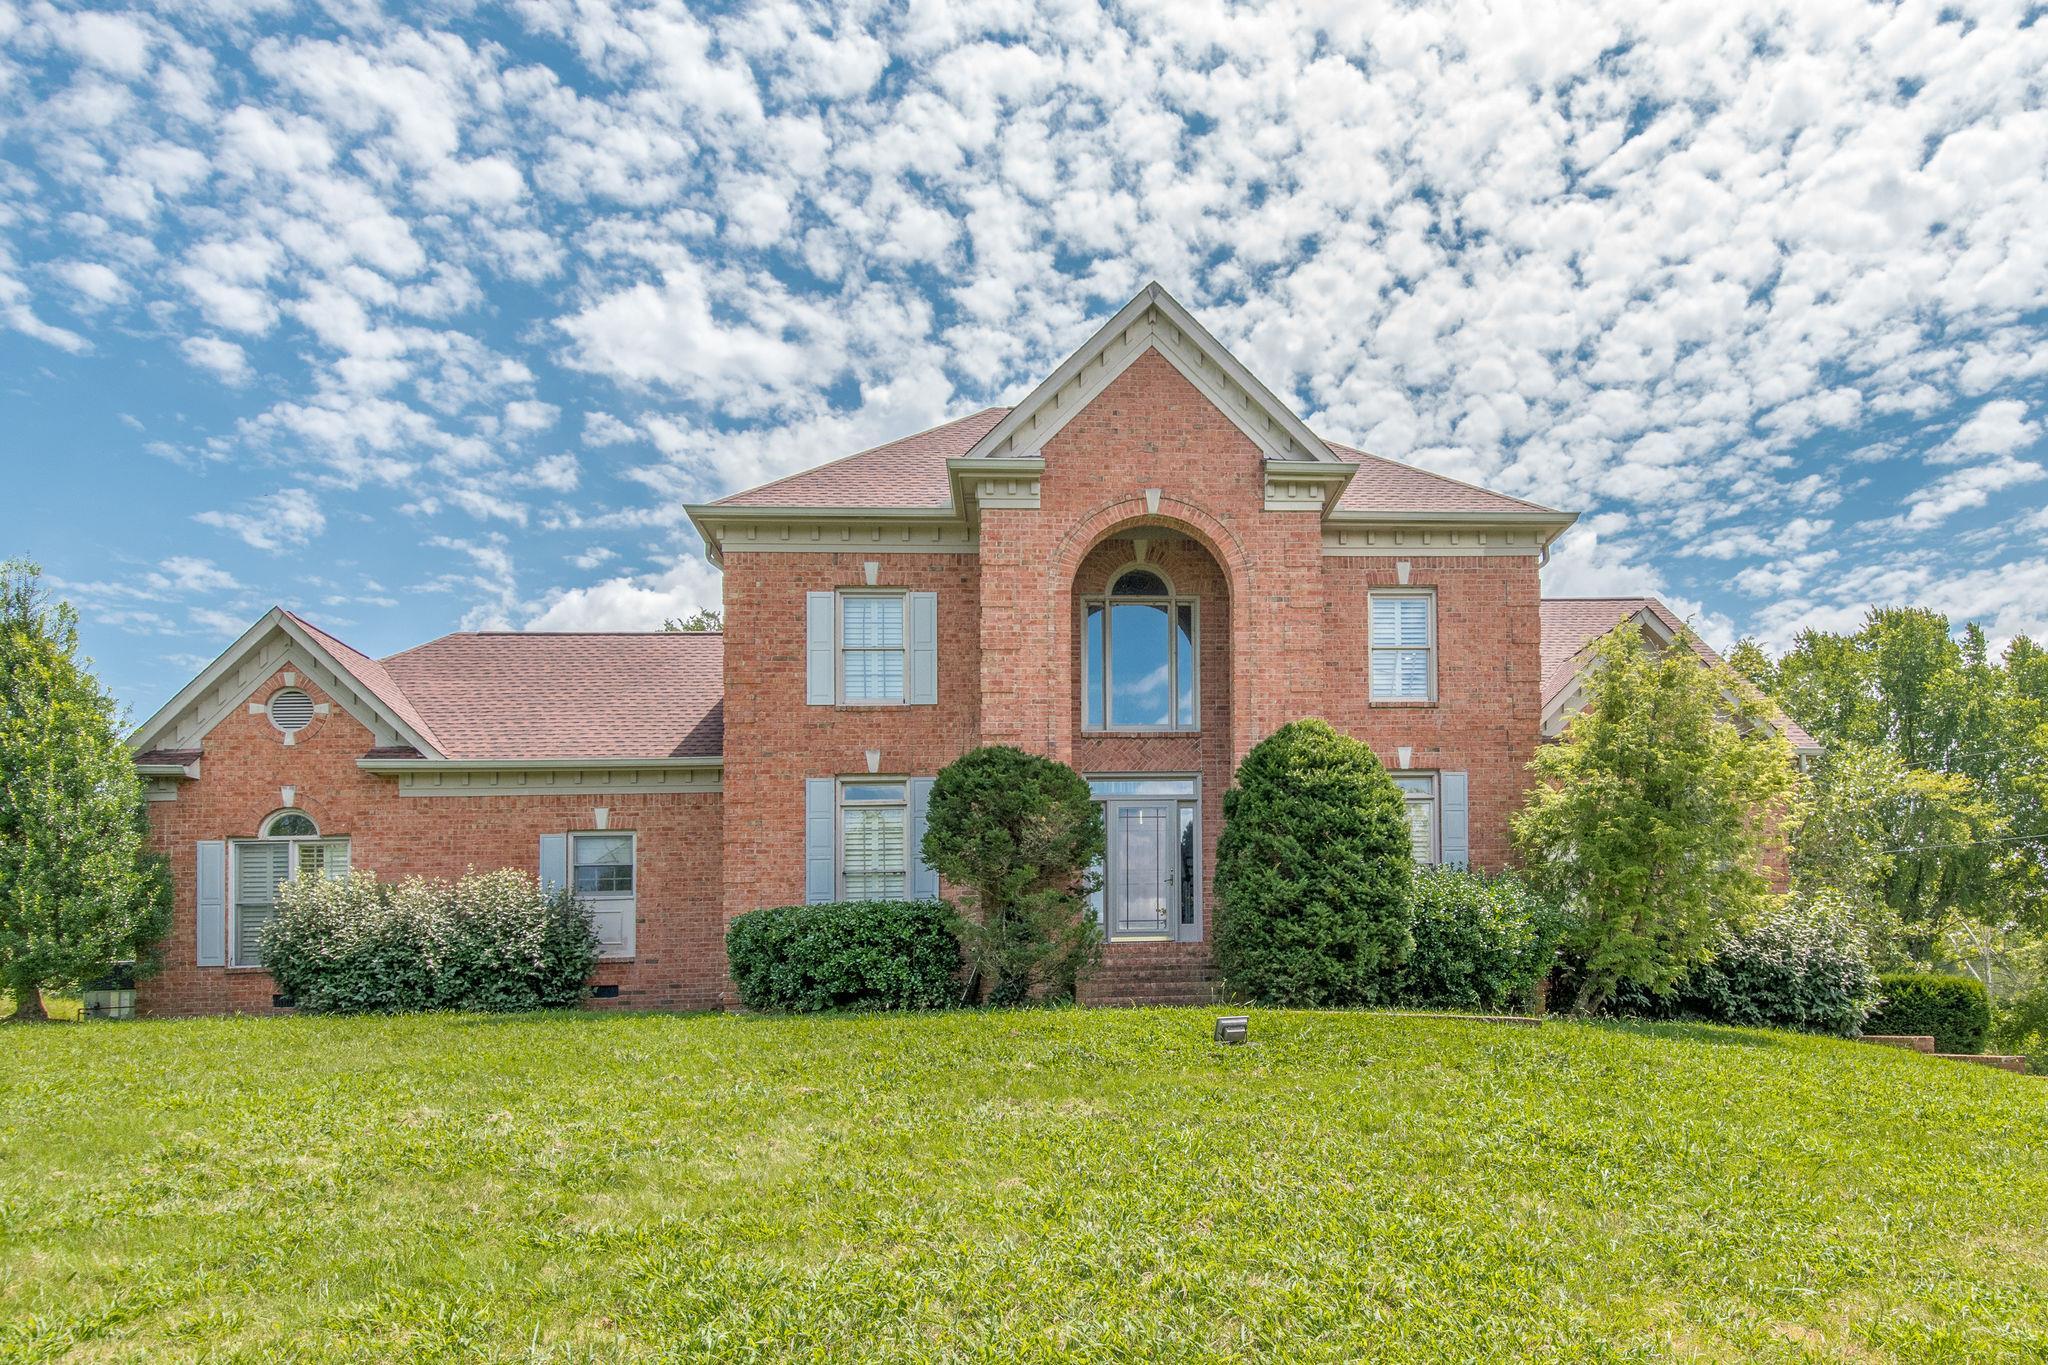 6864 Comstock Rd, College Grove, TN 37046 - College Grove, TN real estate listing